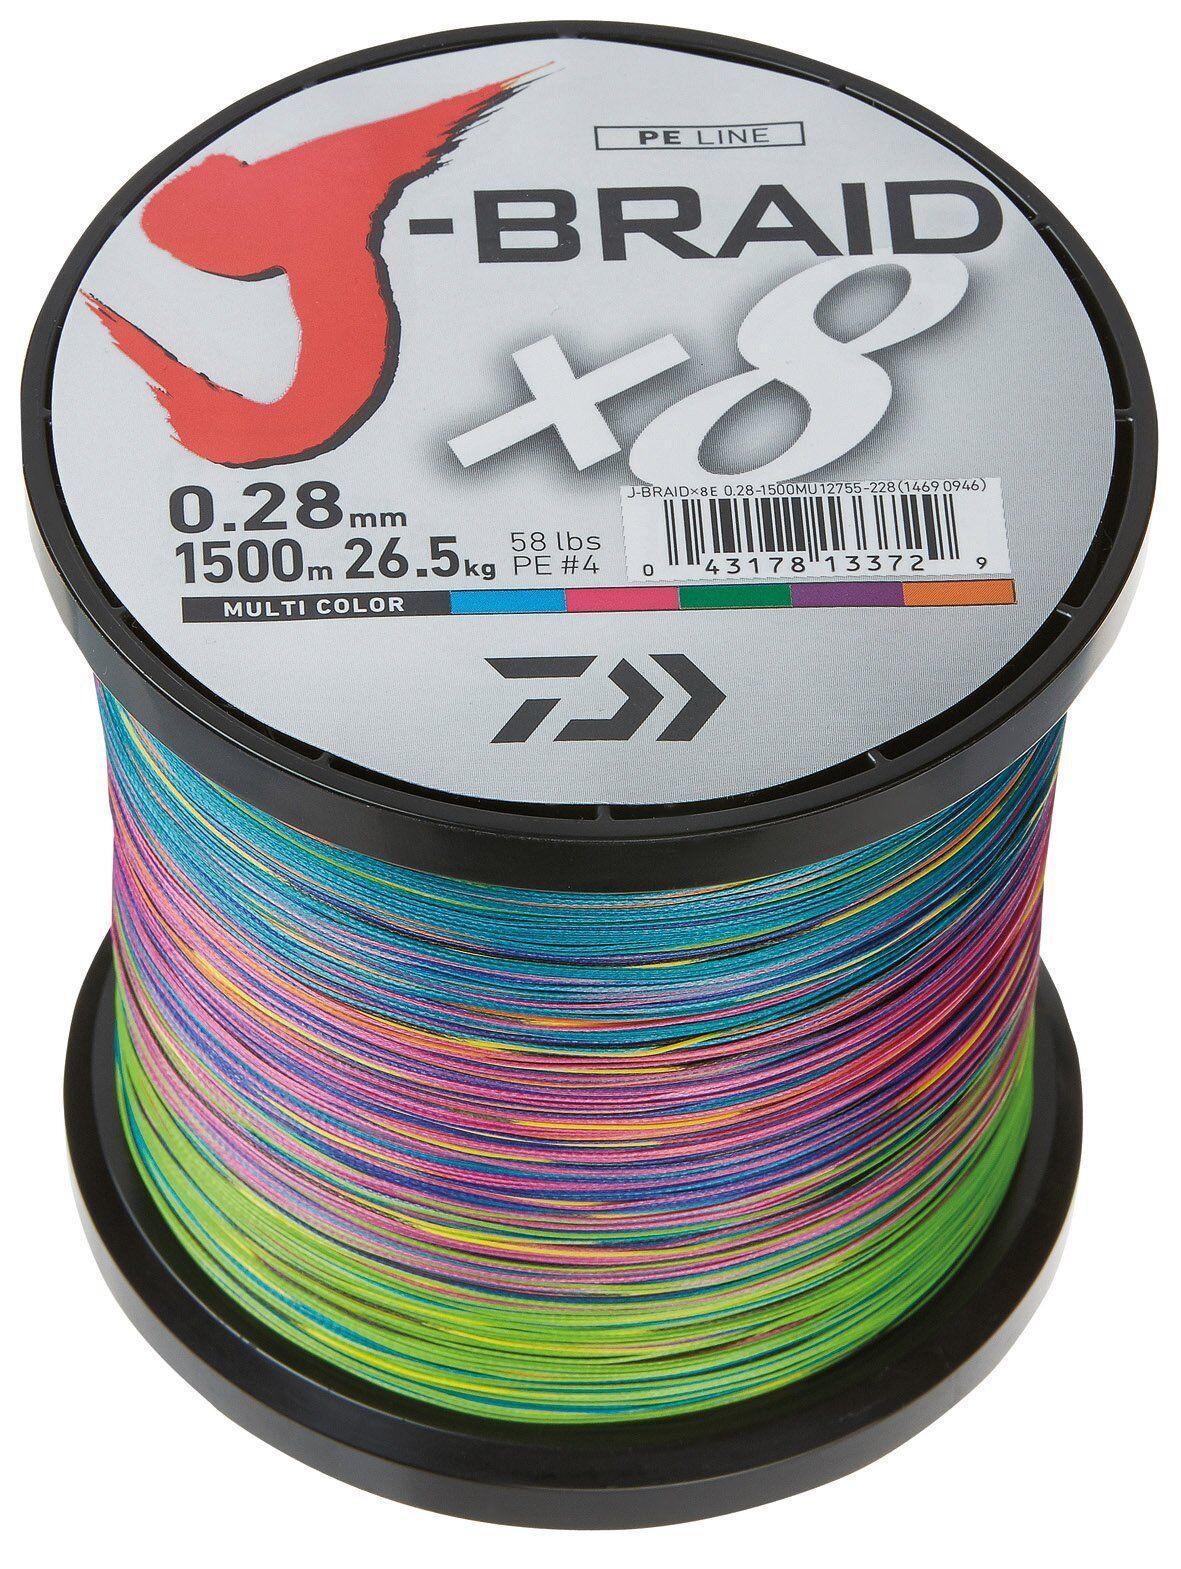 Daiwa J-Braid 8 Braid 300m multicolour - geflochtene Angelschnur